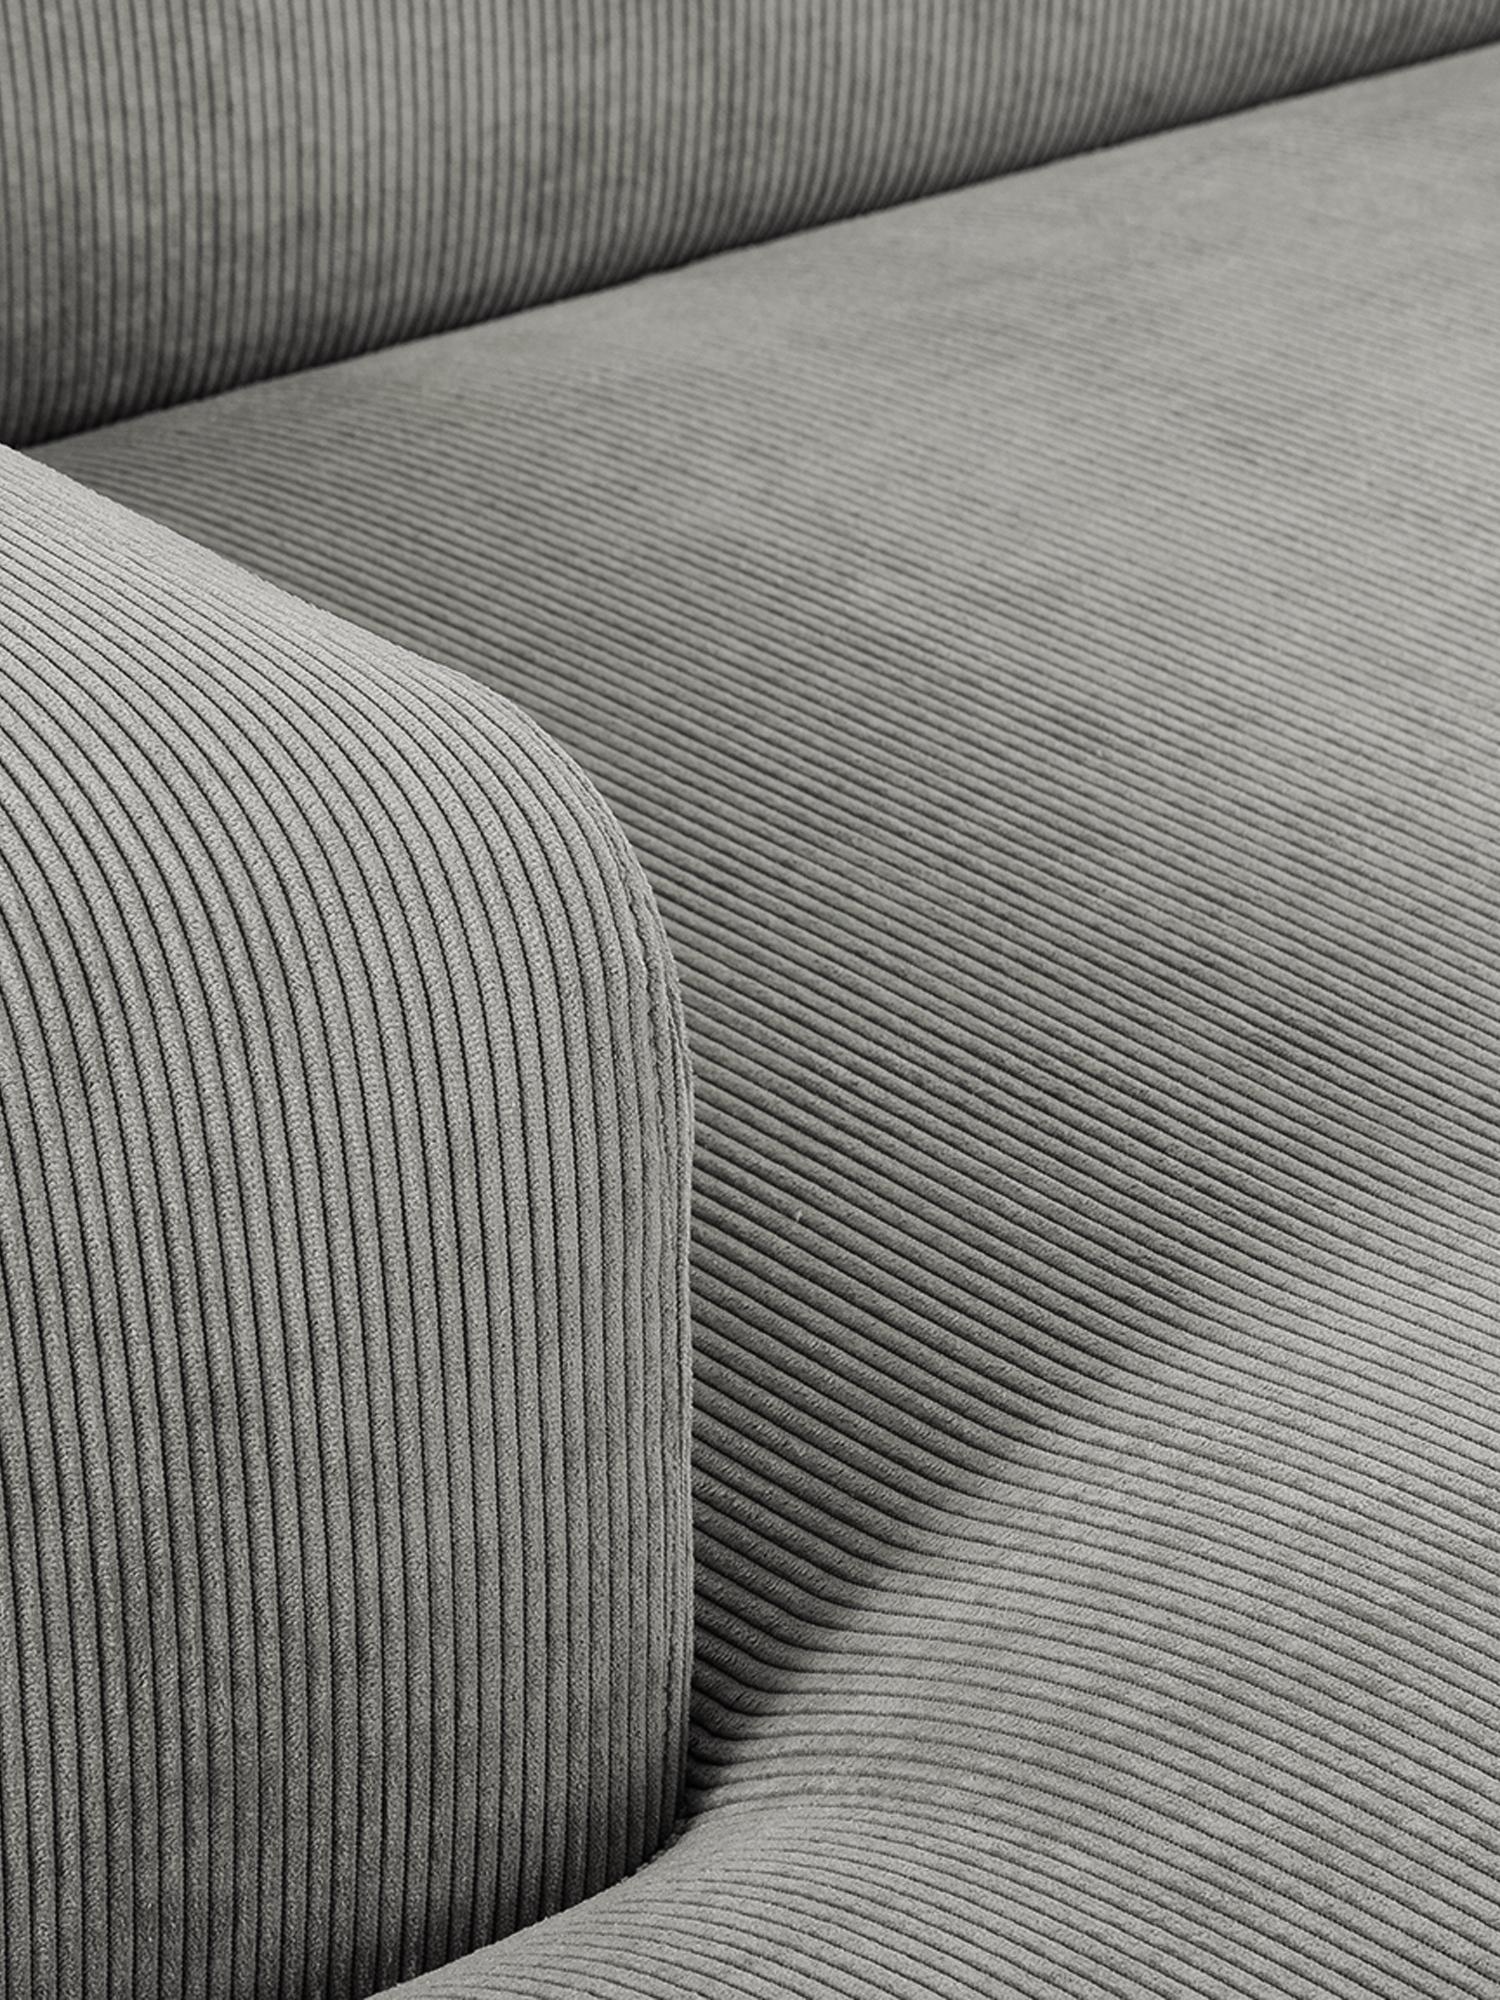 Corduroy hoekbank Melva (3-zits), Bekleding: corduroy (92% polyester, , Frame: massief grenenhout, spaan, Poten: grenenhout, Grijs, B 240 x D 144 cm